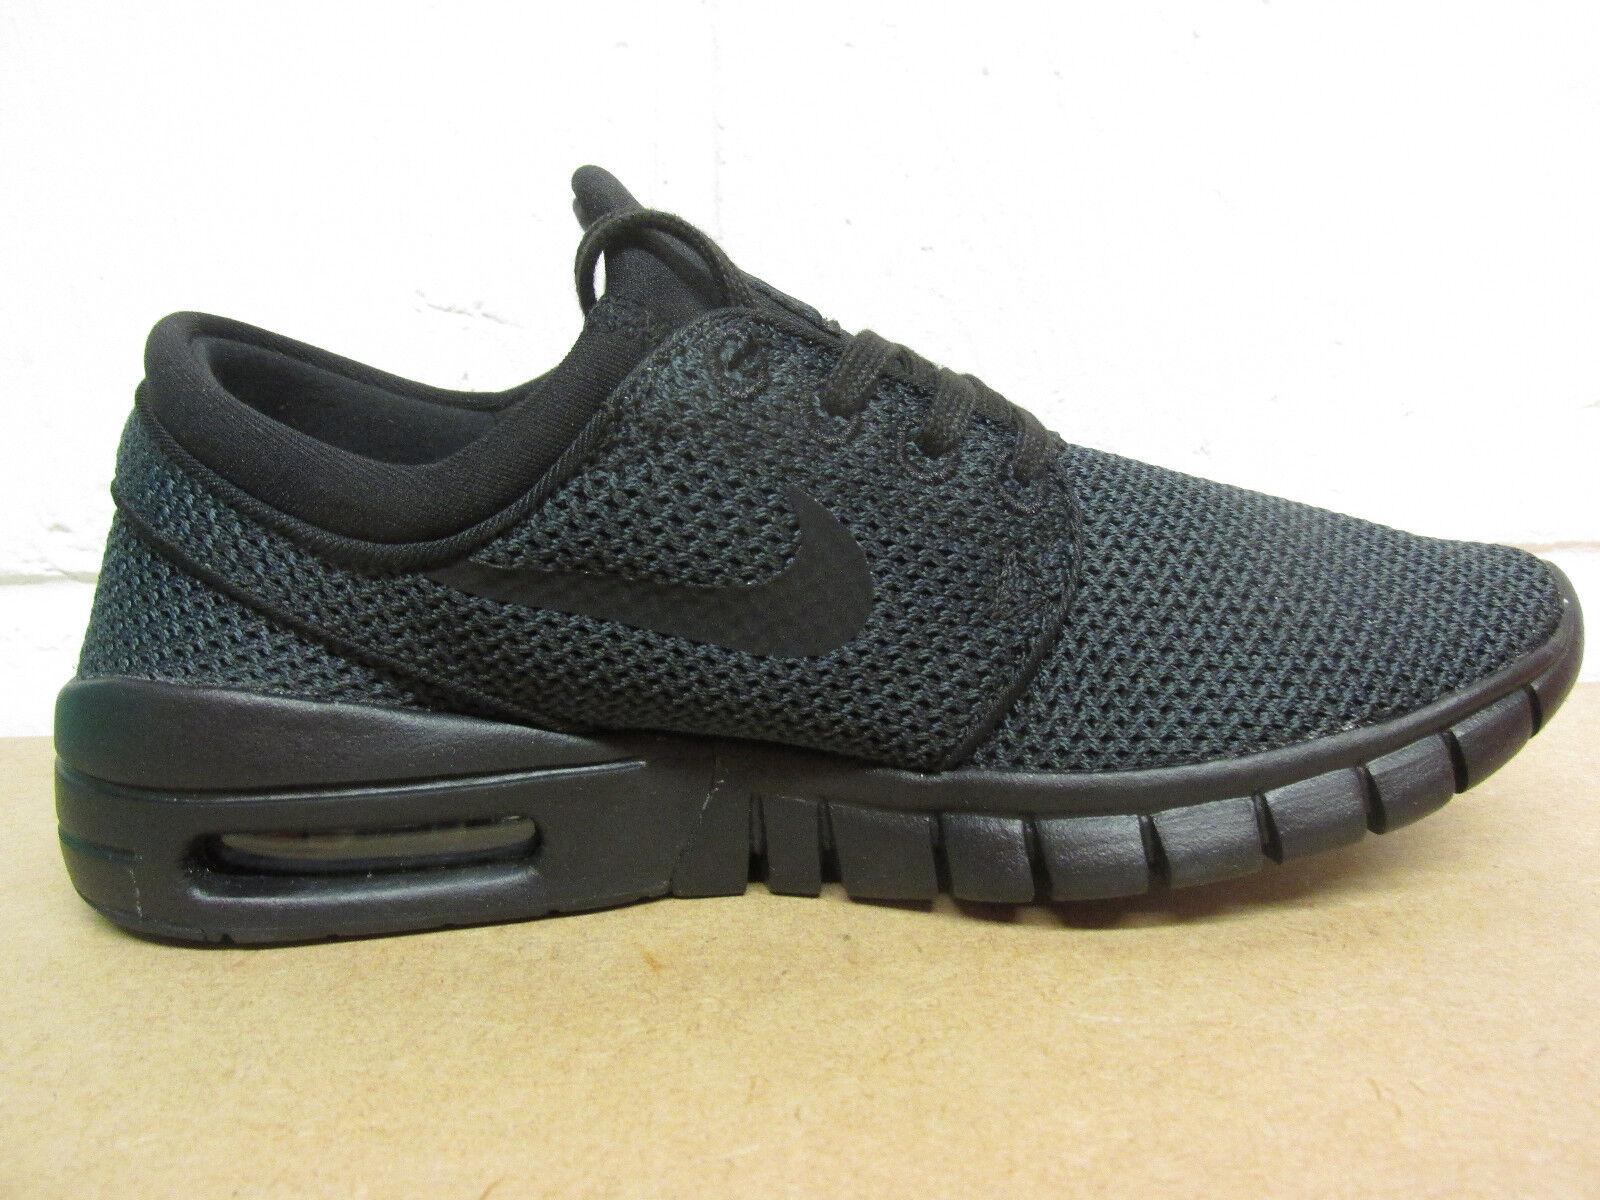 Nike scarpe, sb stefan janoski max Uomo formatori 631303 013 scarpe, Nike scarpe 30bee7